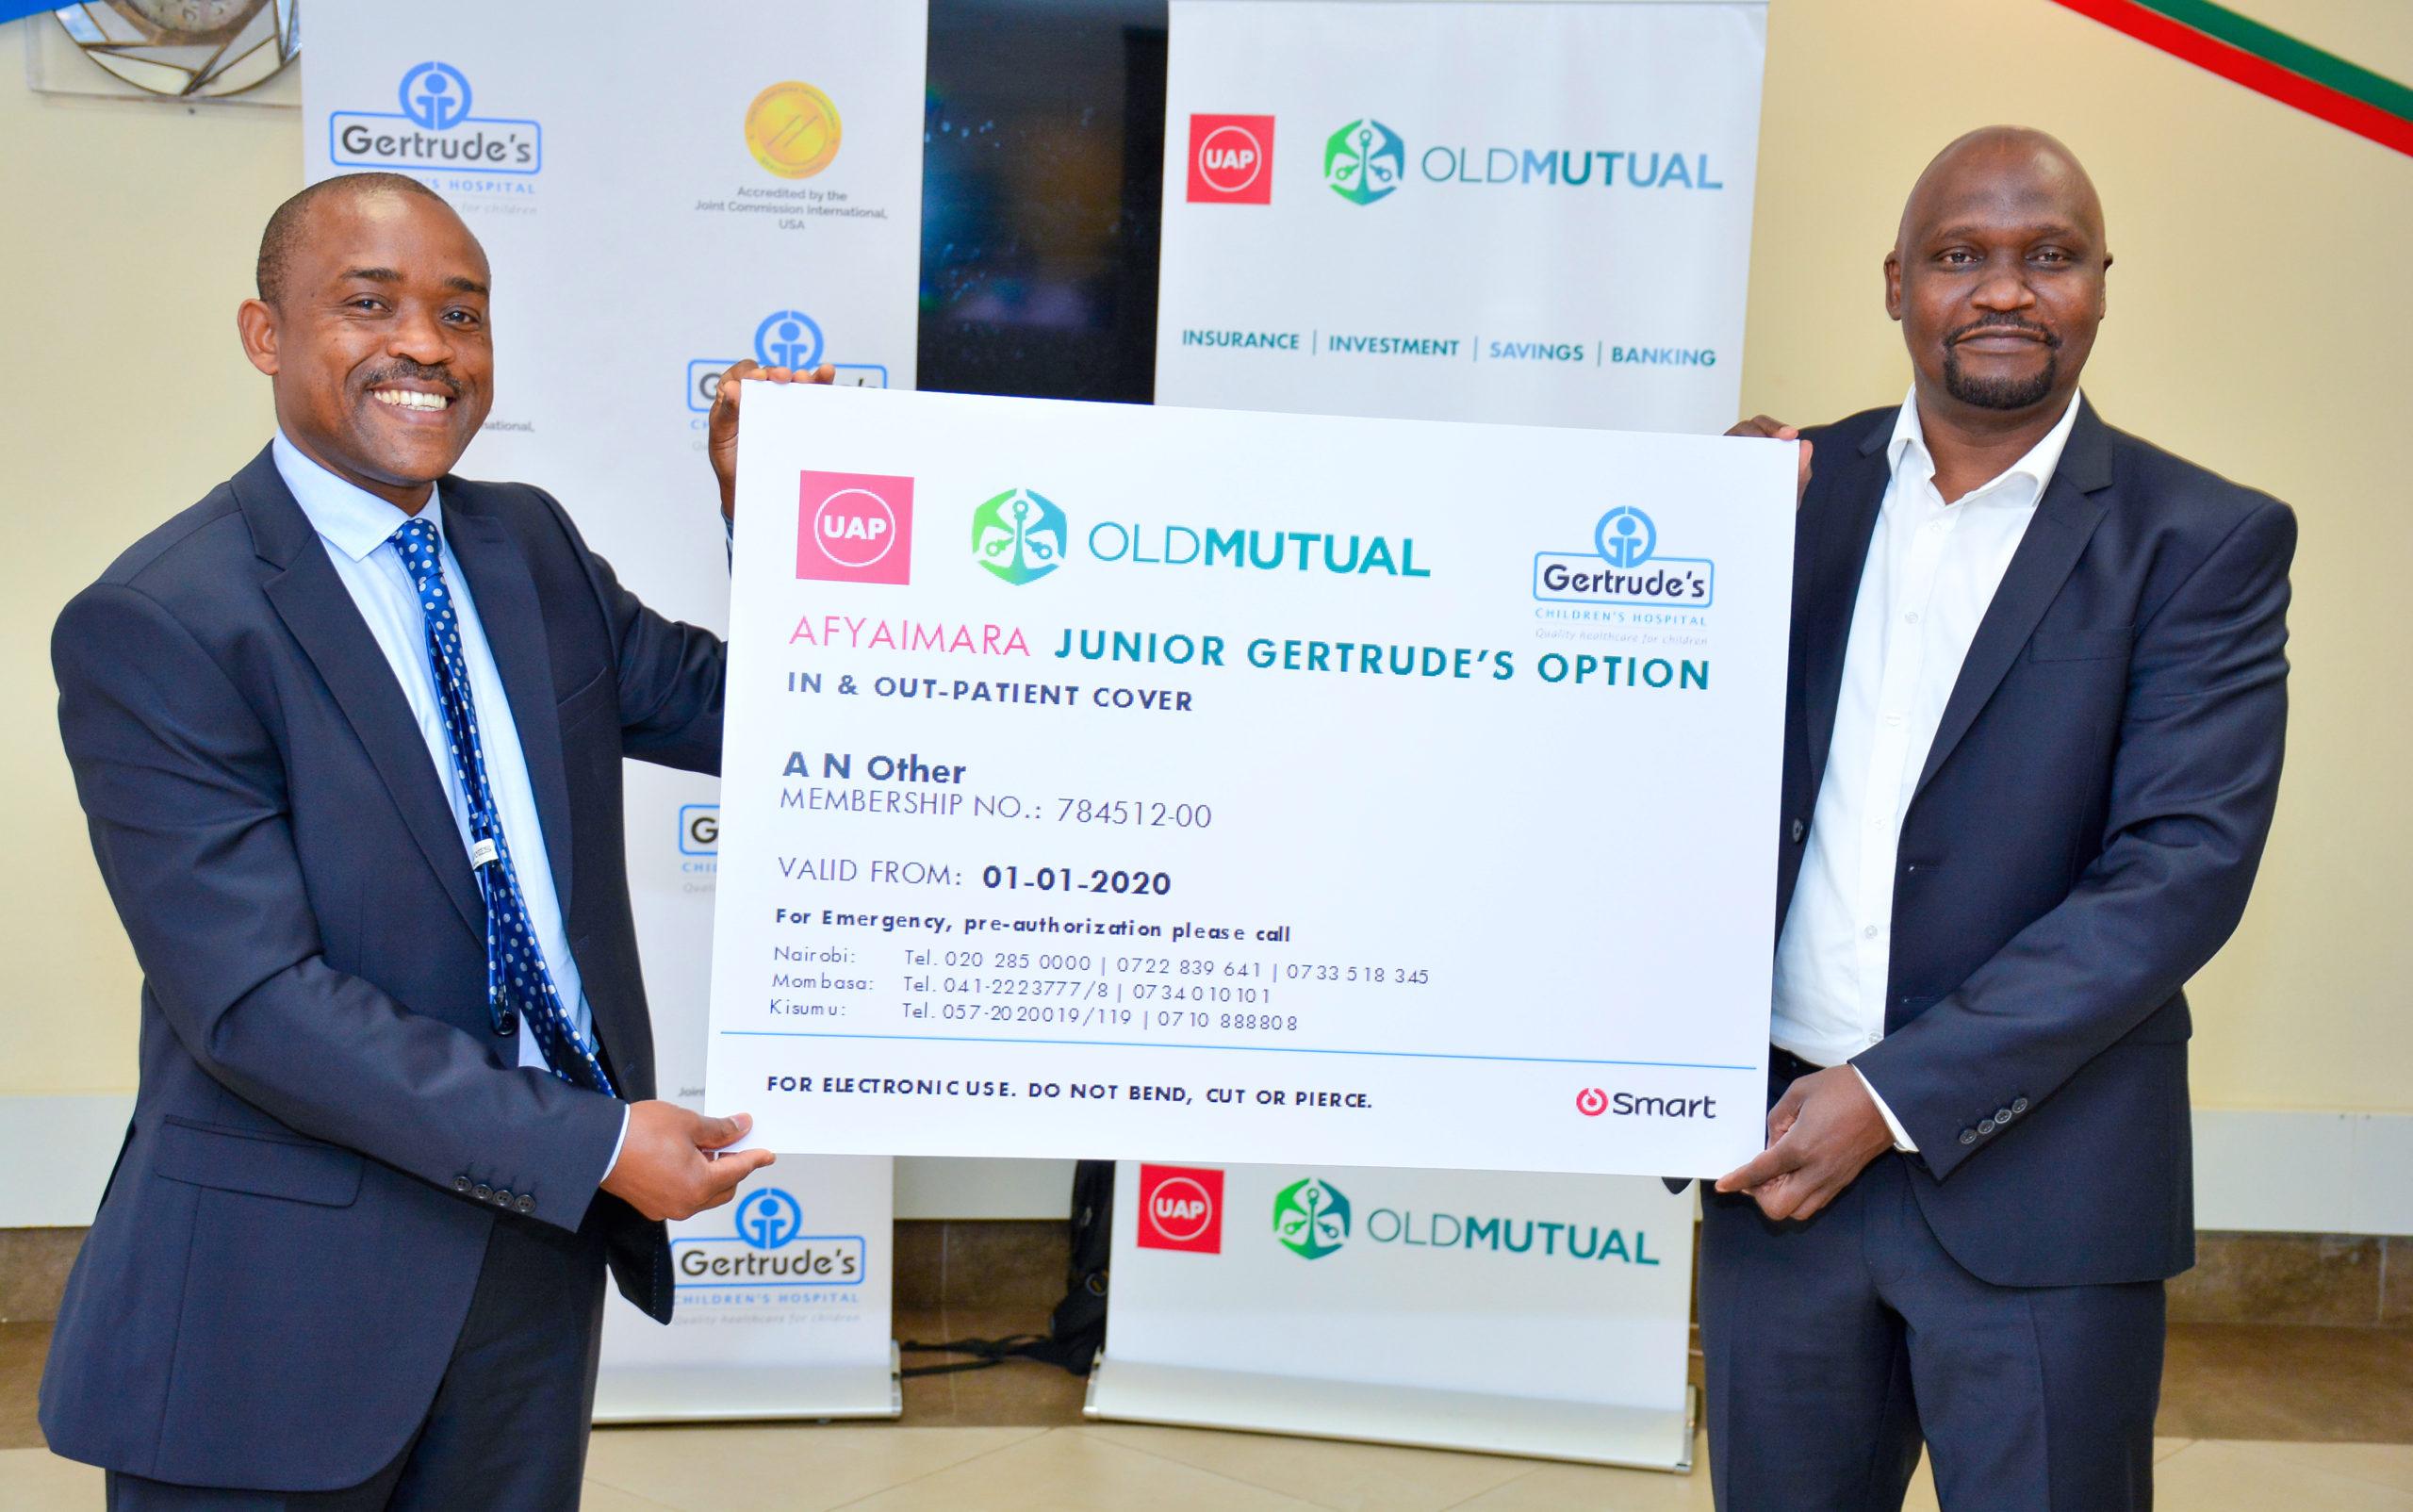 L-R, Robert Nyarango (CEO Gertrude's Children's Hospital), Japheth Ogalloh (GM Health Business UAP Old Mutual) 3